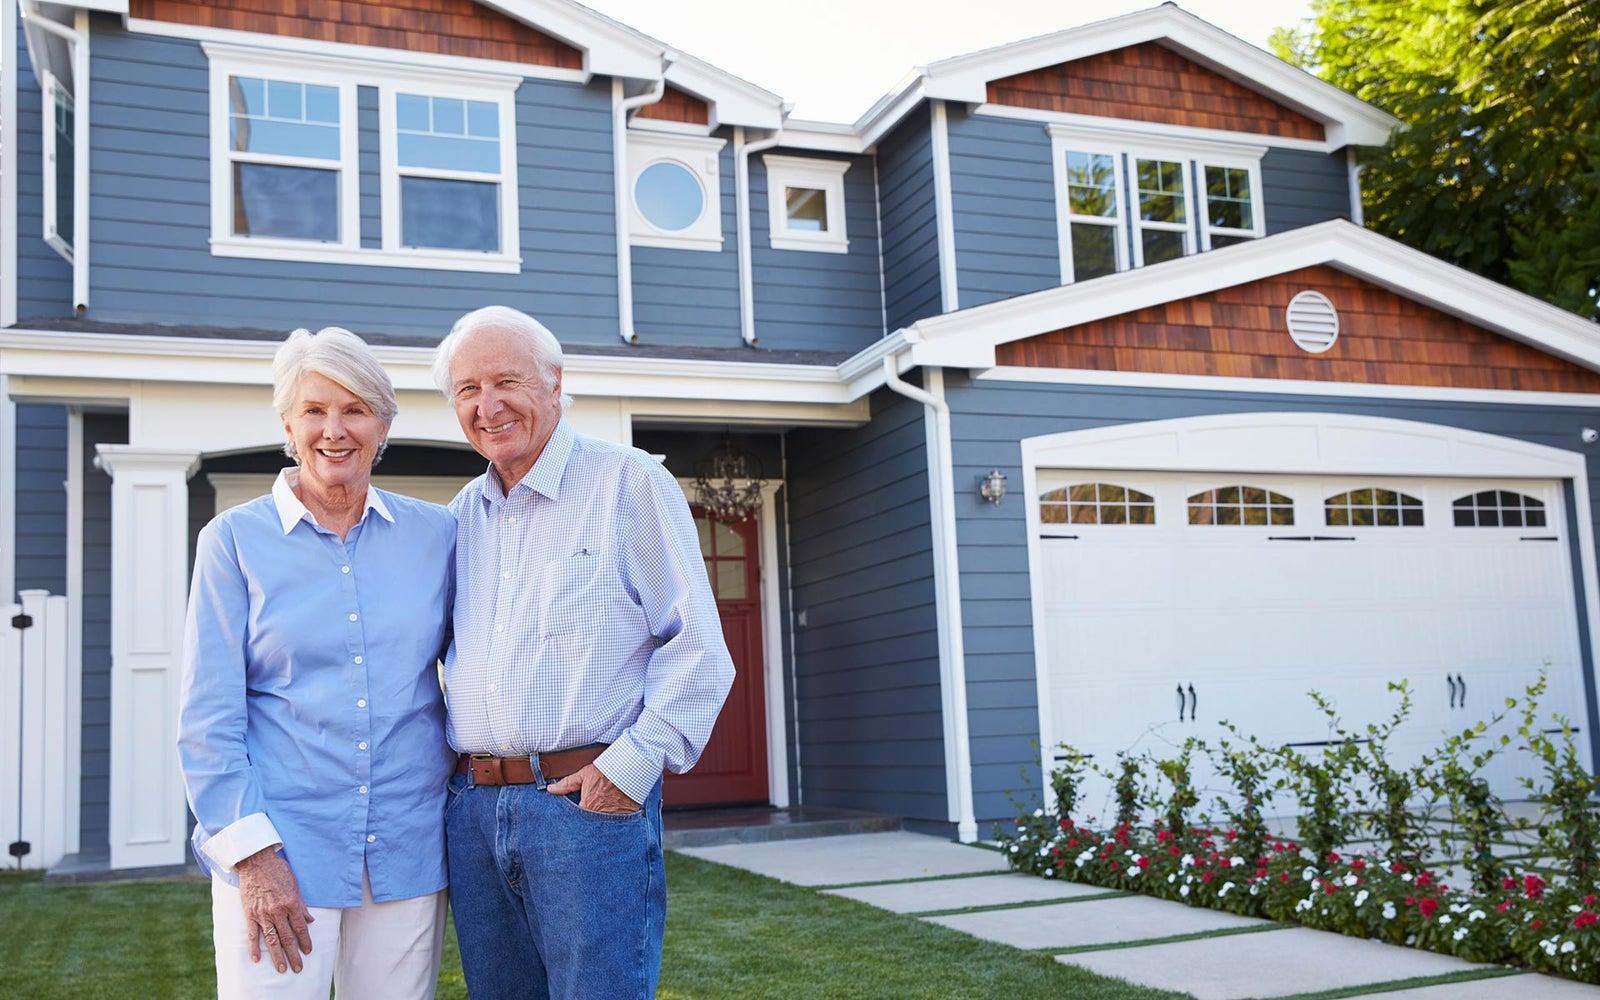 Choosing a Retirement Destination: Factors to Consider When Deciding Where to Retire